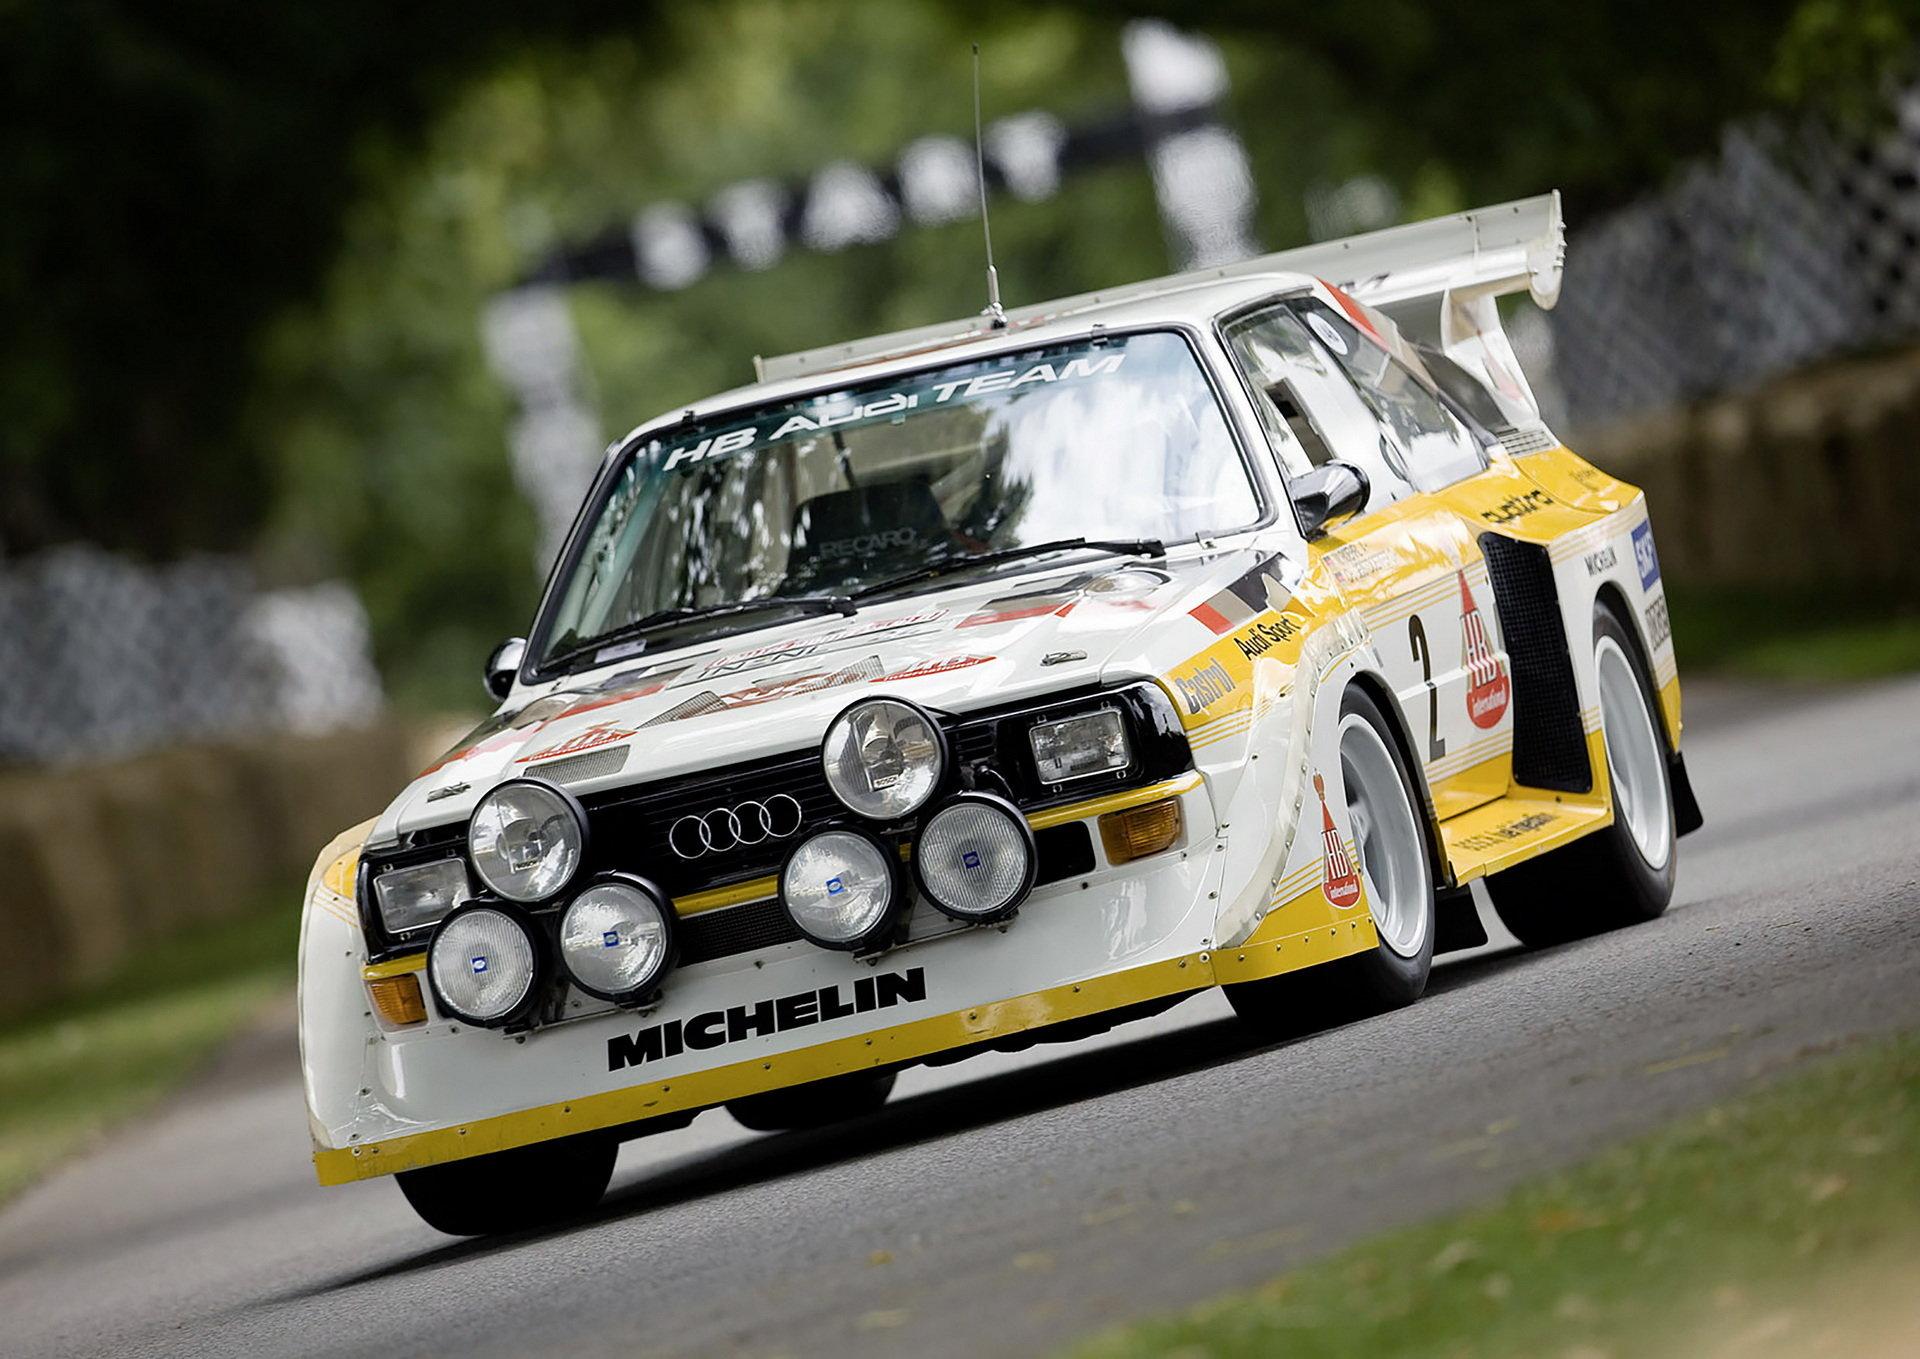 1985-Audi-Sport-Quattro-S1-E2-5.jpg